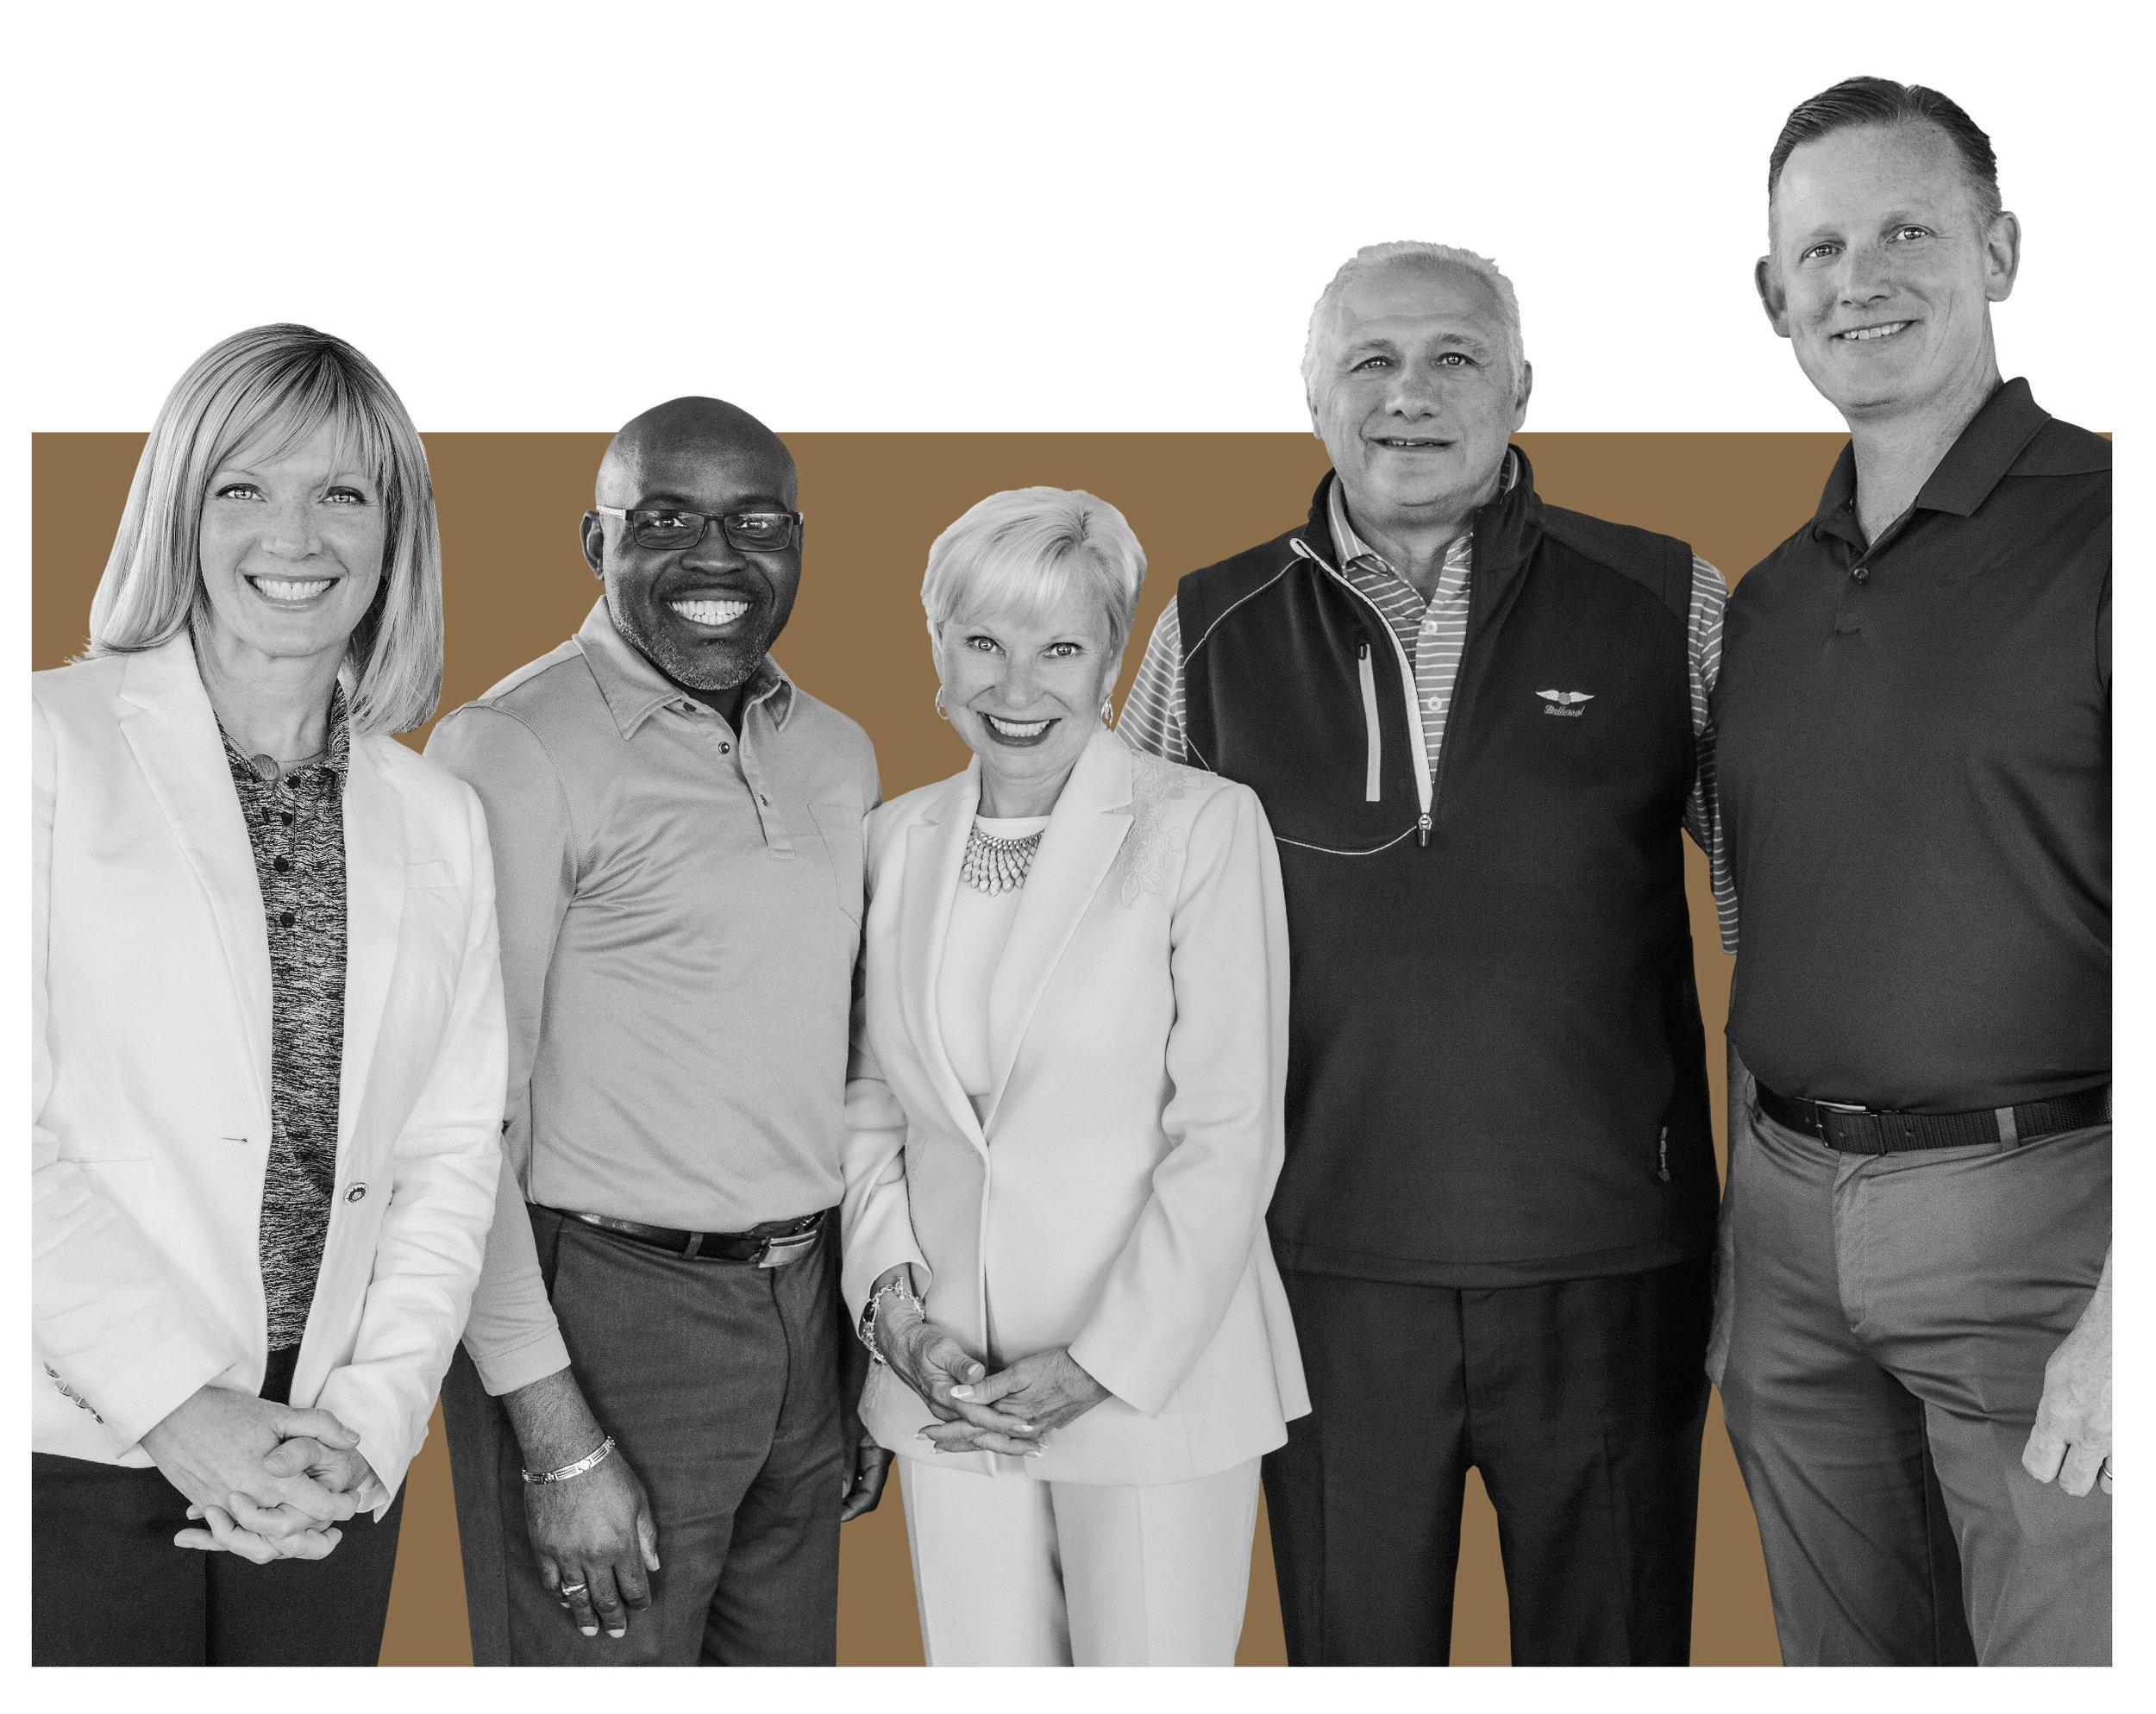 Pictured above: Gretchen Wood, Dr. Lloyd Holmes, Lauren Dixon, Rick Brienzi  ' 79 and Tom Gears.